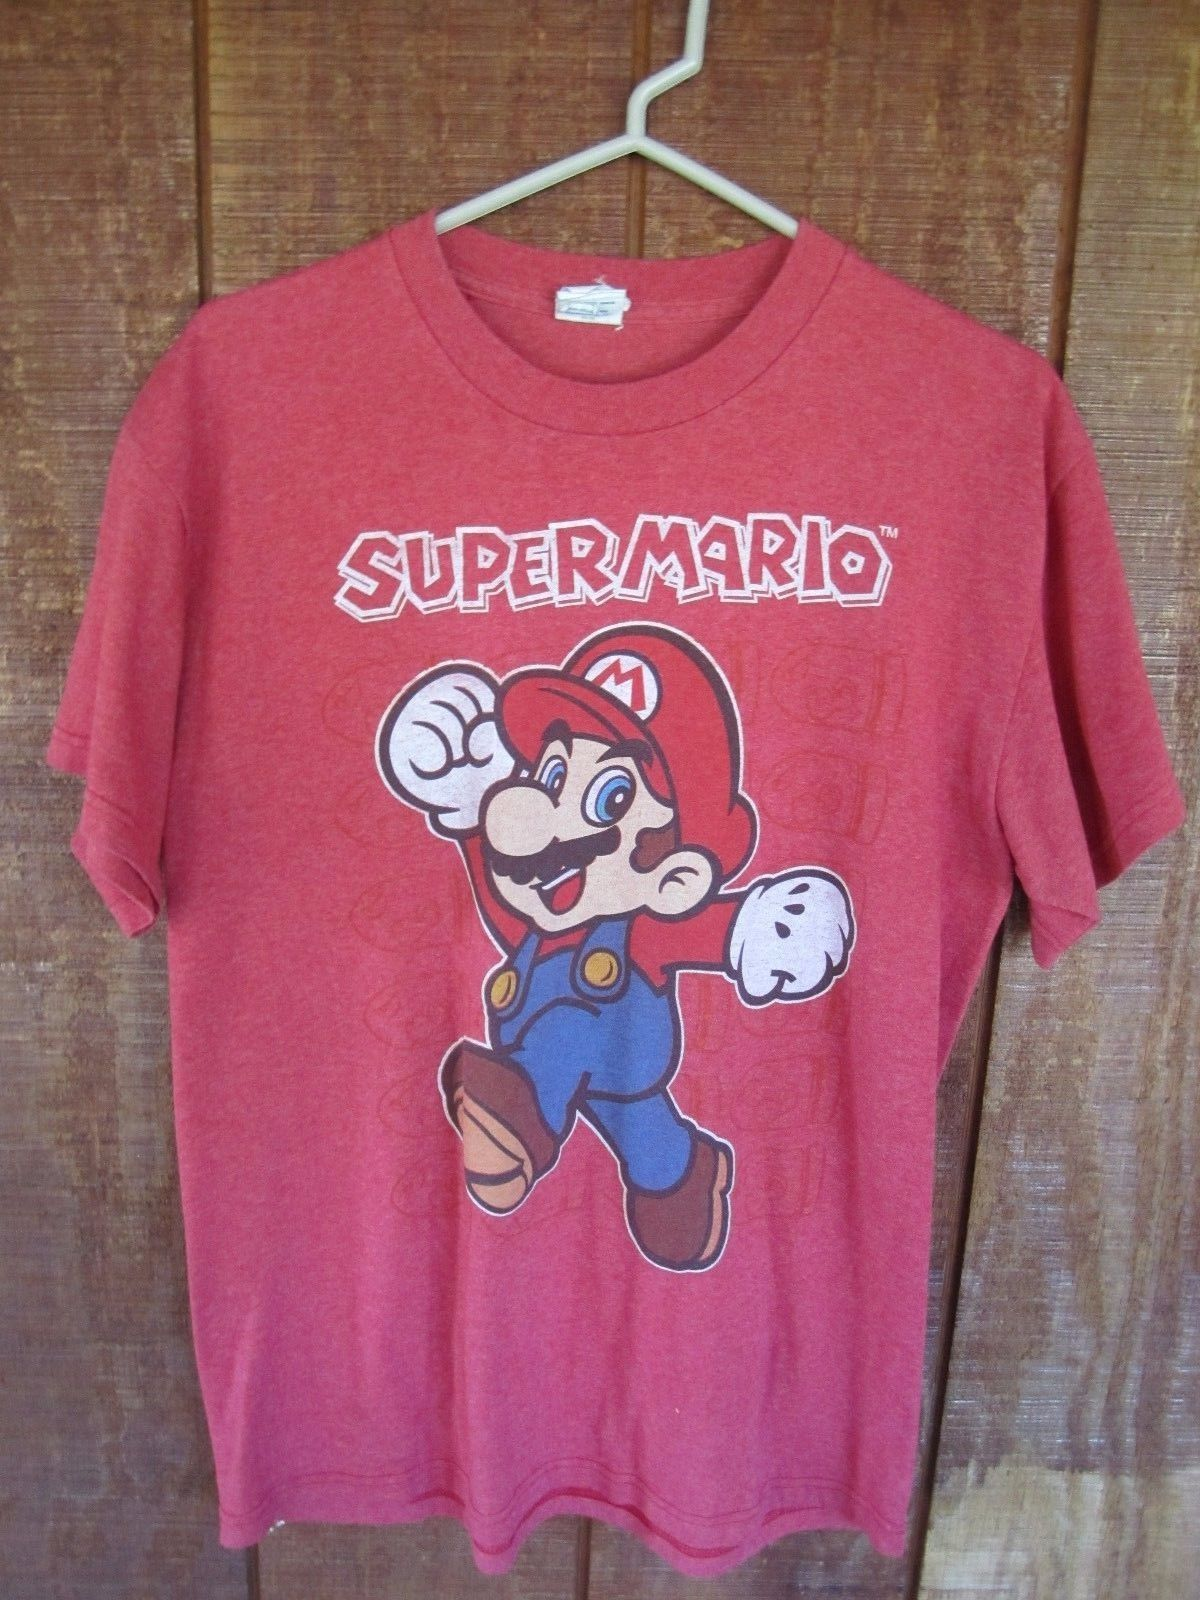 SUPER MARIO Red T Shirt Size Medium Delta Pro Weight Nintendo - $11.87